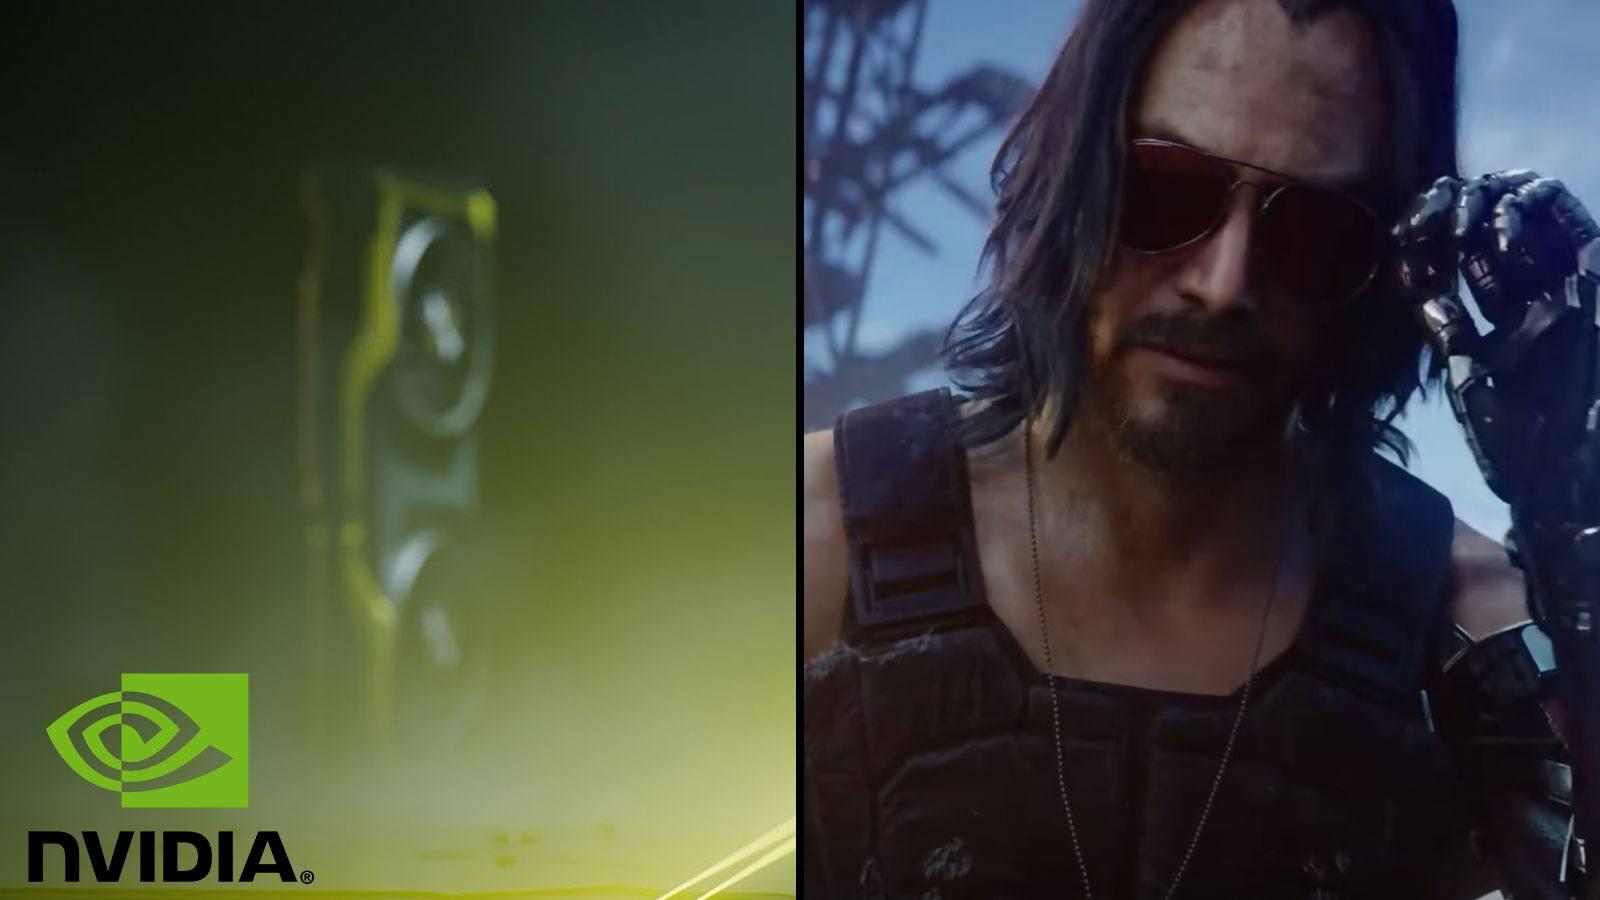 NVIDIA teasing GPU | Keanu Reeves CD Pojekt RED